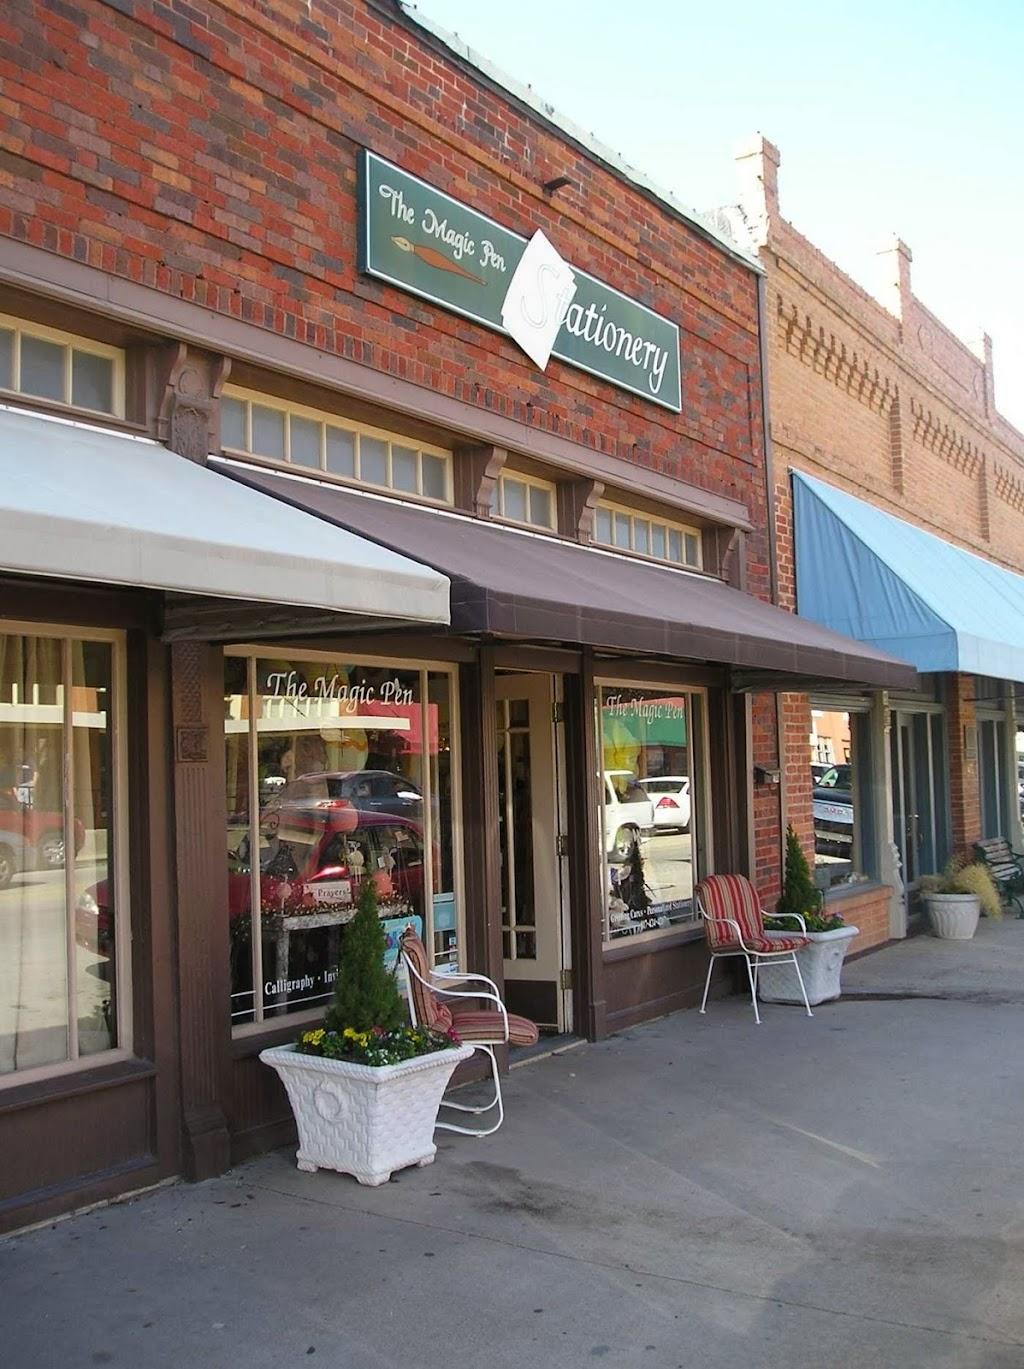 Magic Pen & Party - store  | Photo 1 of 10 | Address: 422 S Main St, Grapevine, TX 76051, USA | Phone: (817) 424-4207